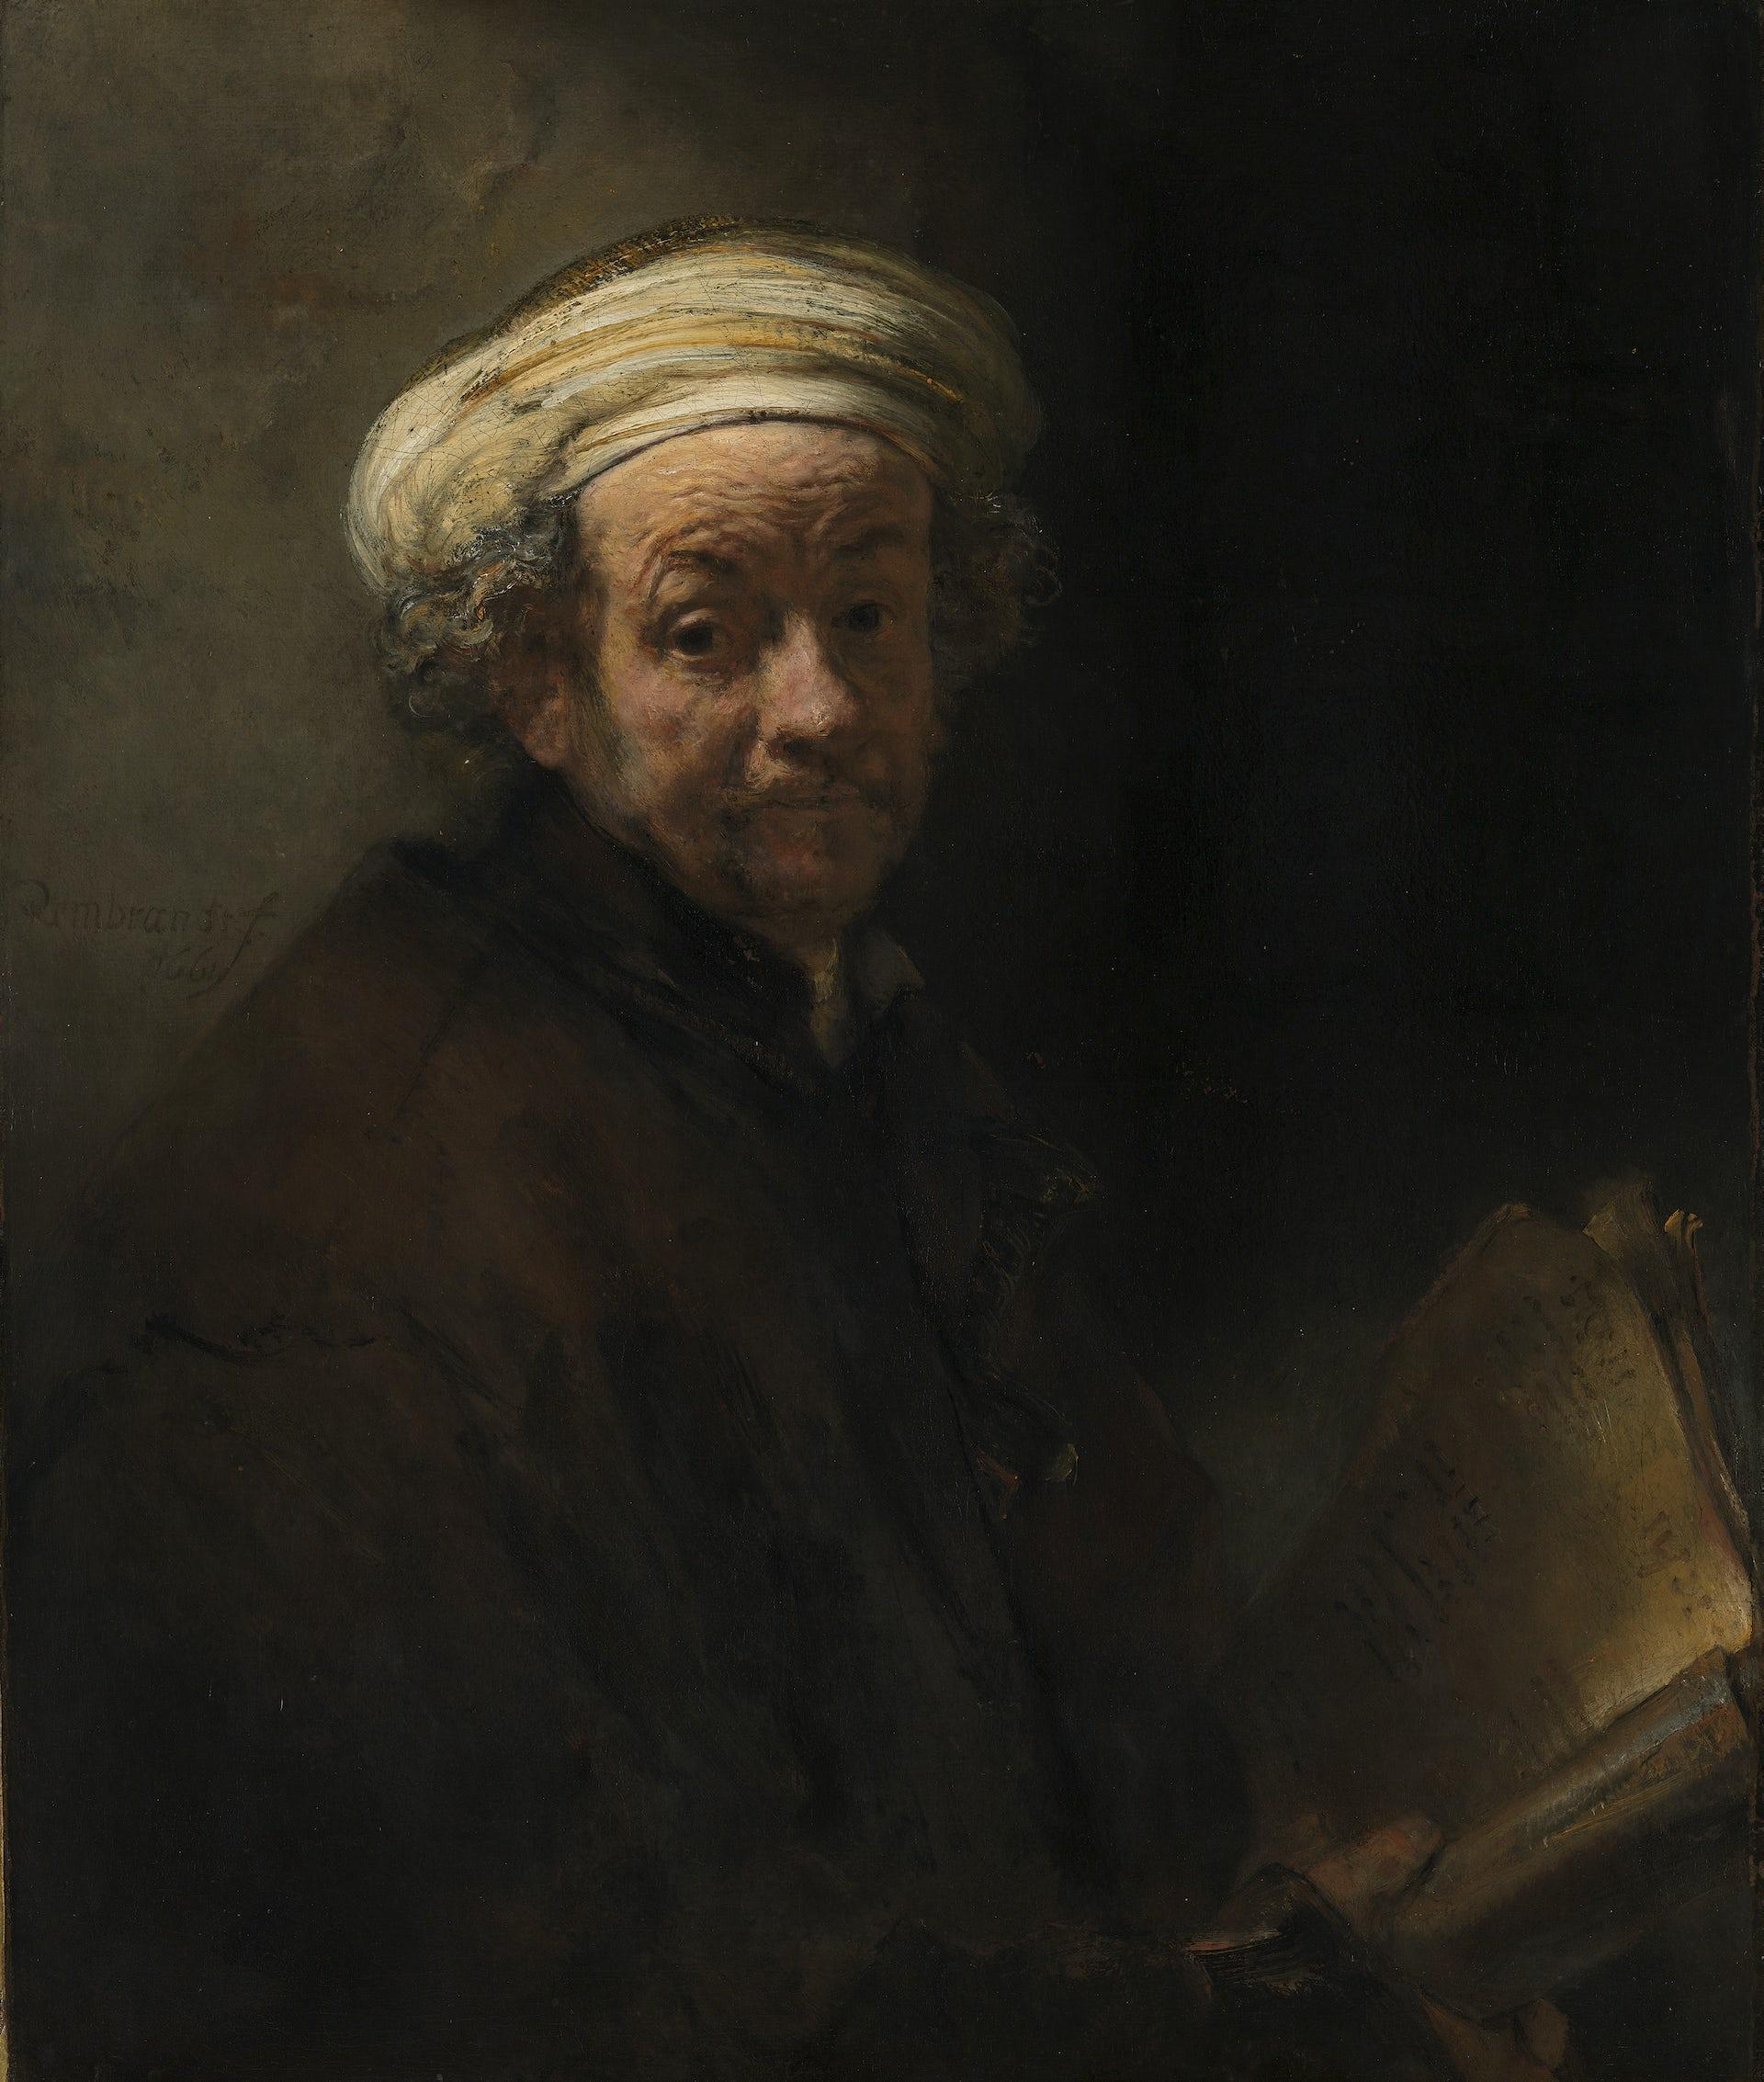 SELF PORTRAIT OF REMBRANDT MASTER DUTCH ARTIST PAINTING ART REAL CANVAS PRINT